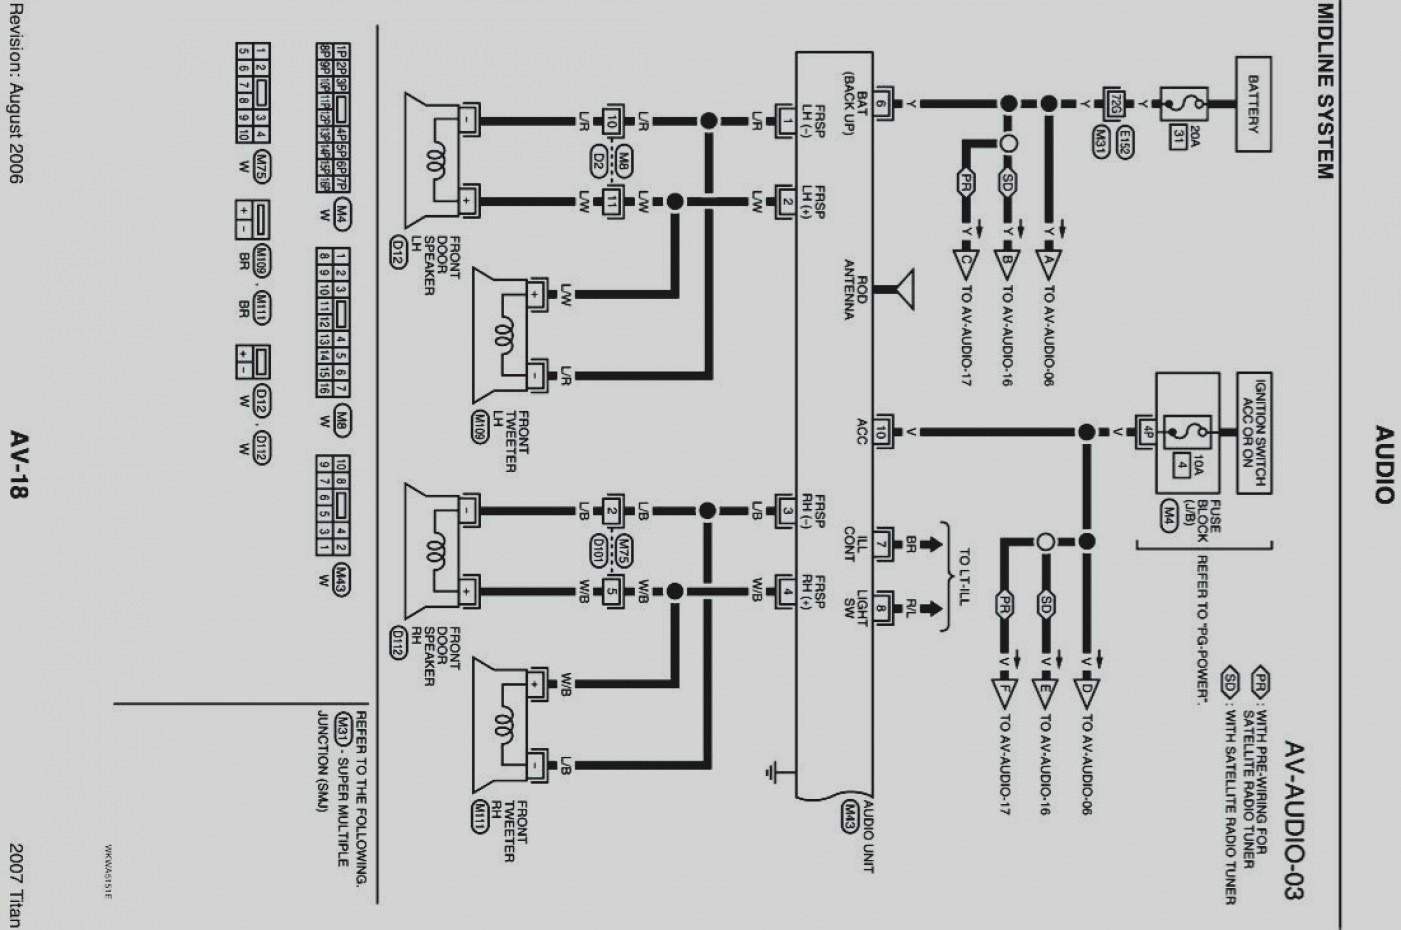 2007 nissan armada fuel pump wiring diagram best wiring library2007 nissan  armada fuel pump wiring diagram